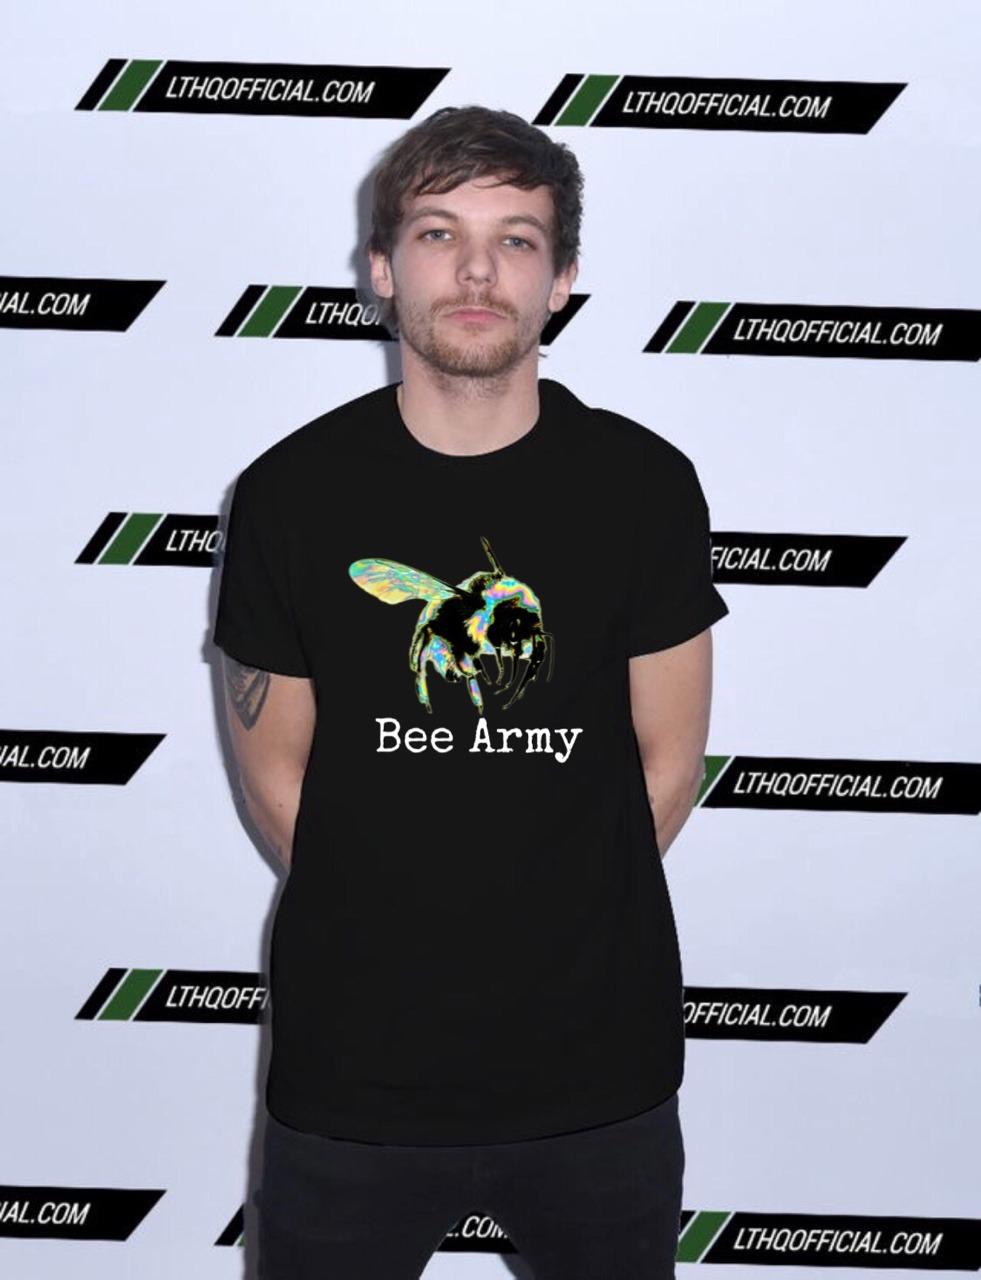 11. Bee Army: Elkoanon